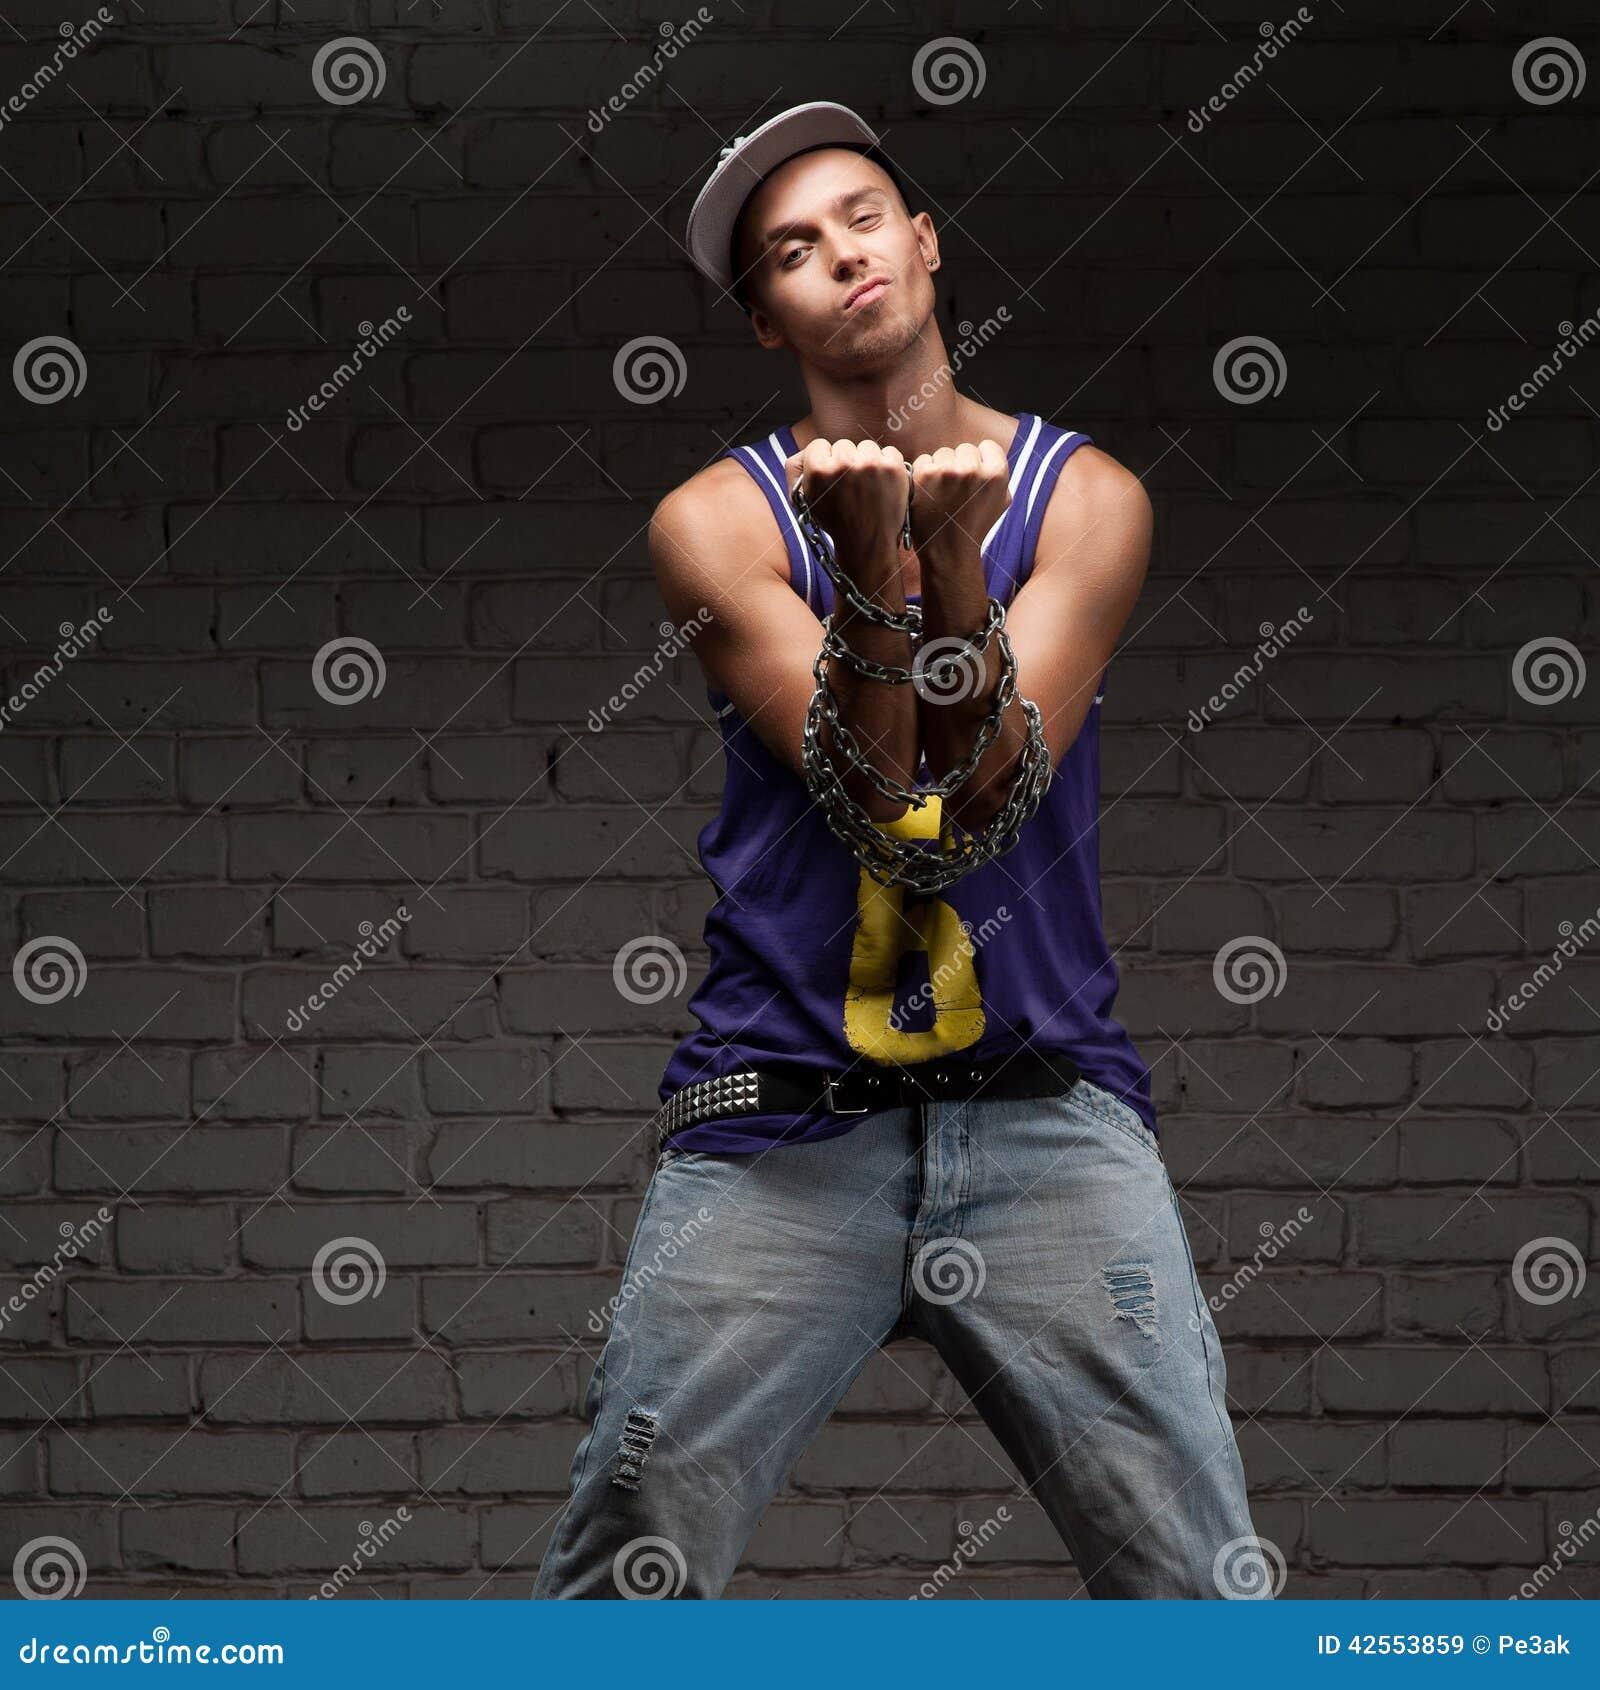 hip hop style man holding baseball bat and chain royalty. Black Bedroom Furniture Sets. Home Design Ideas